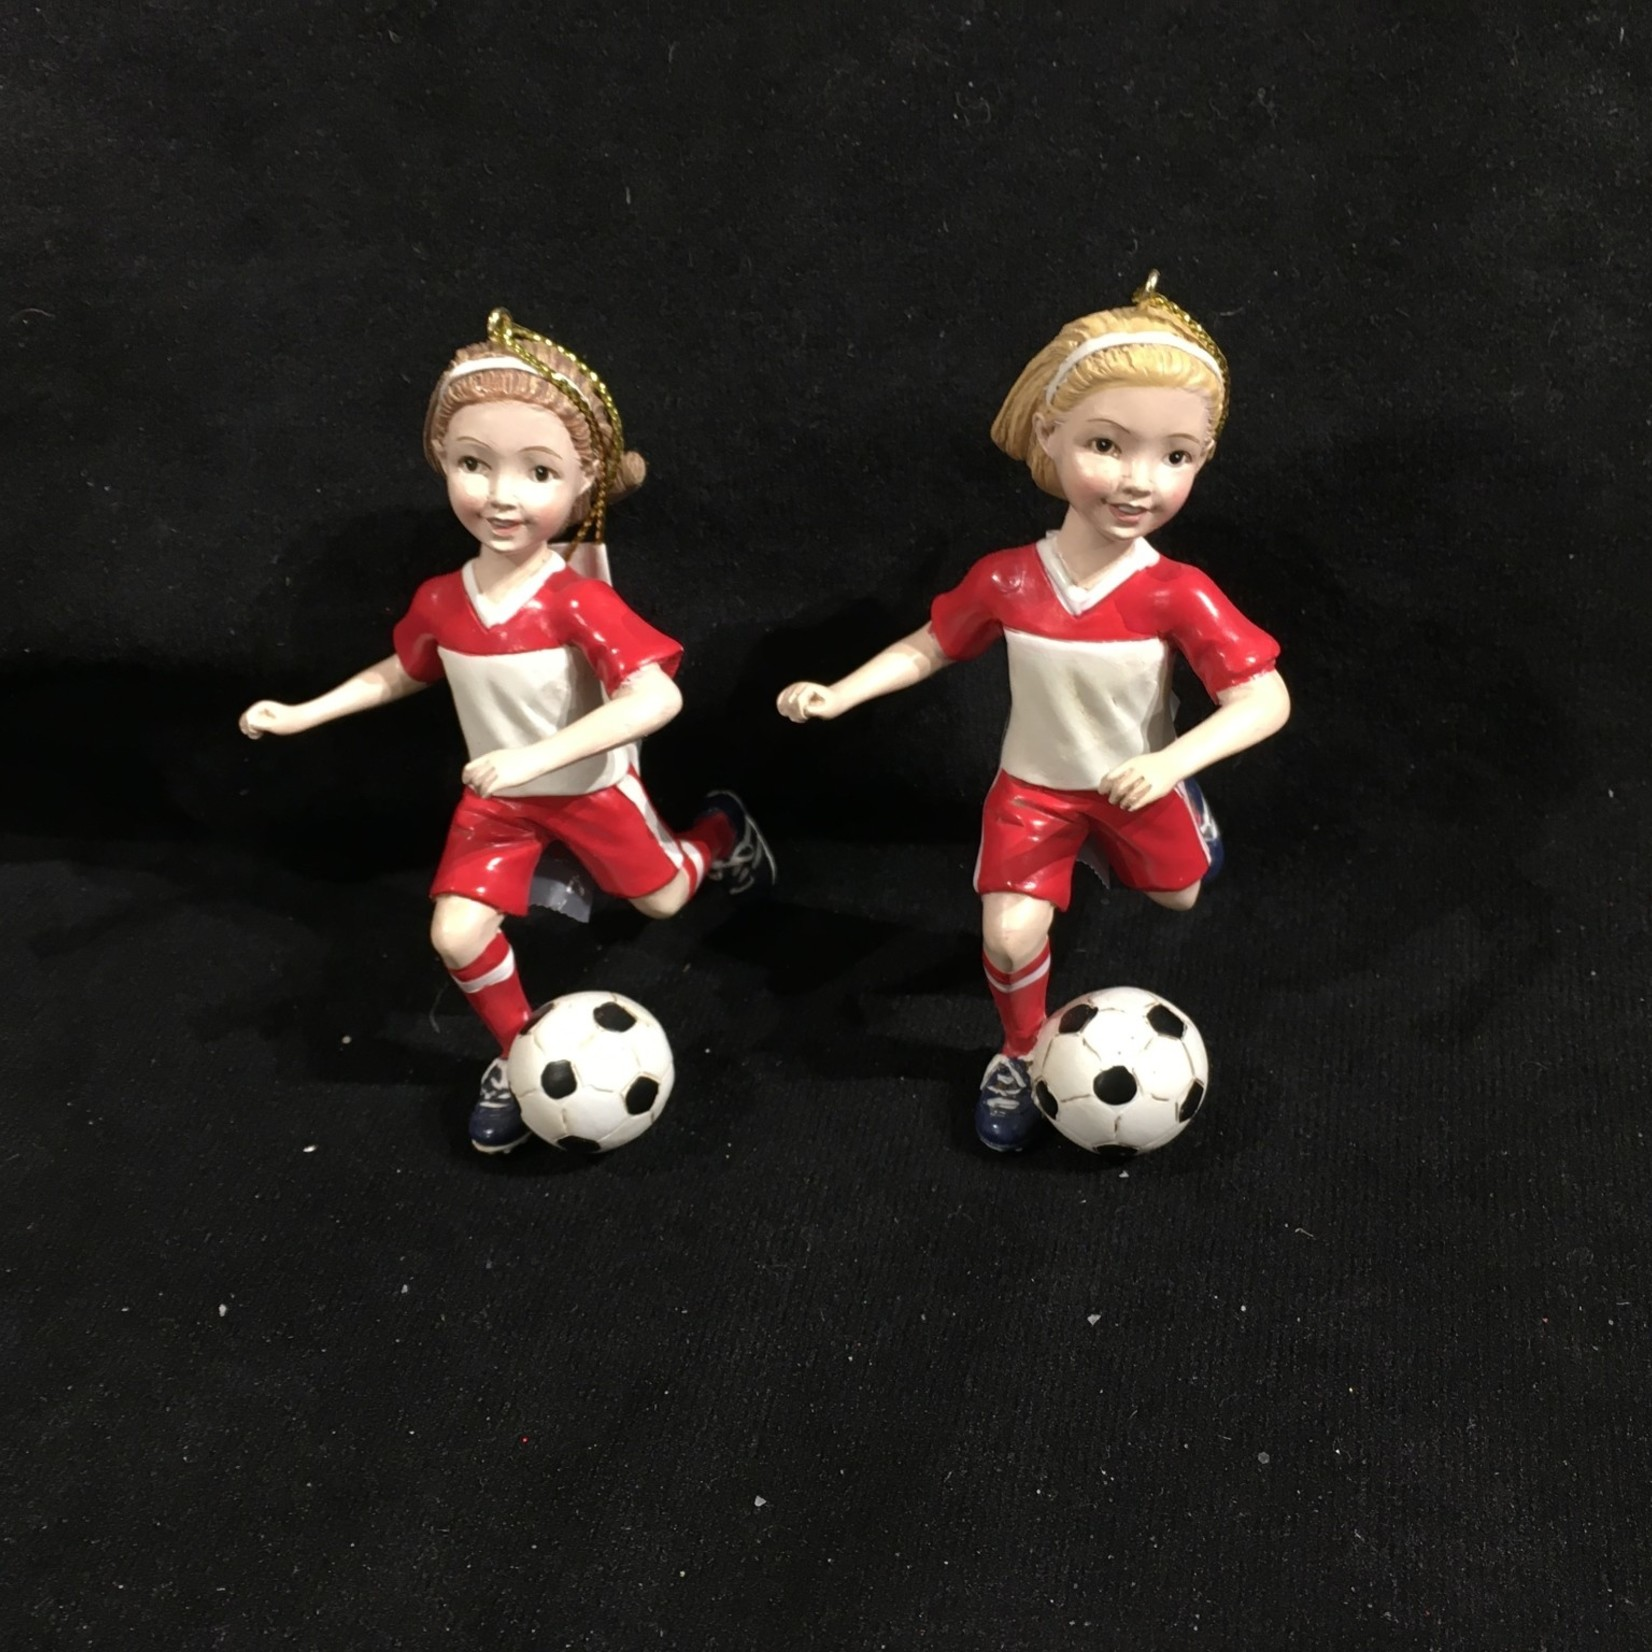 Soccer Girl Orn 2A